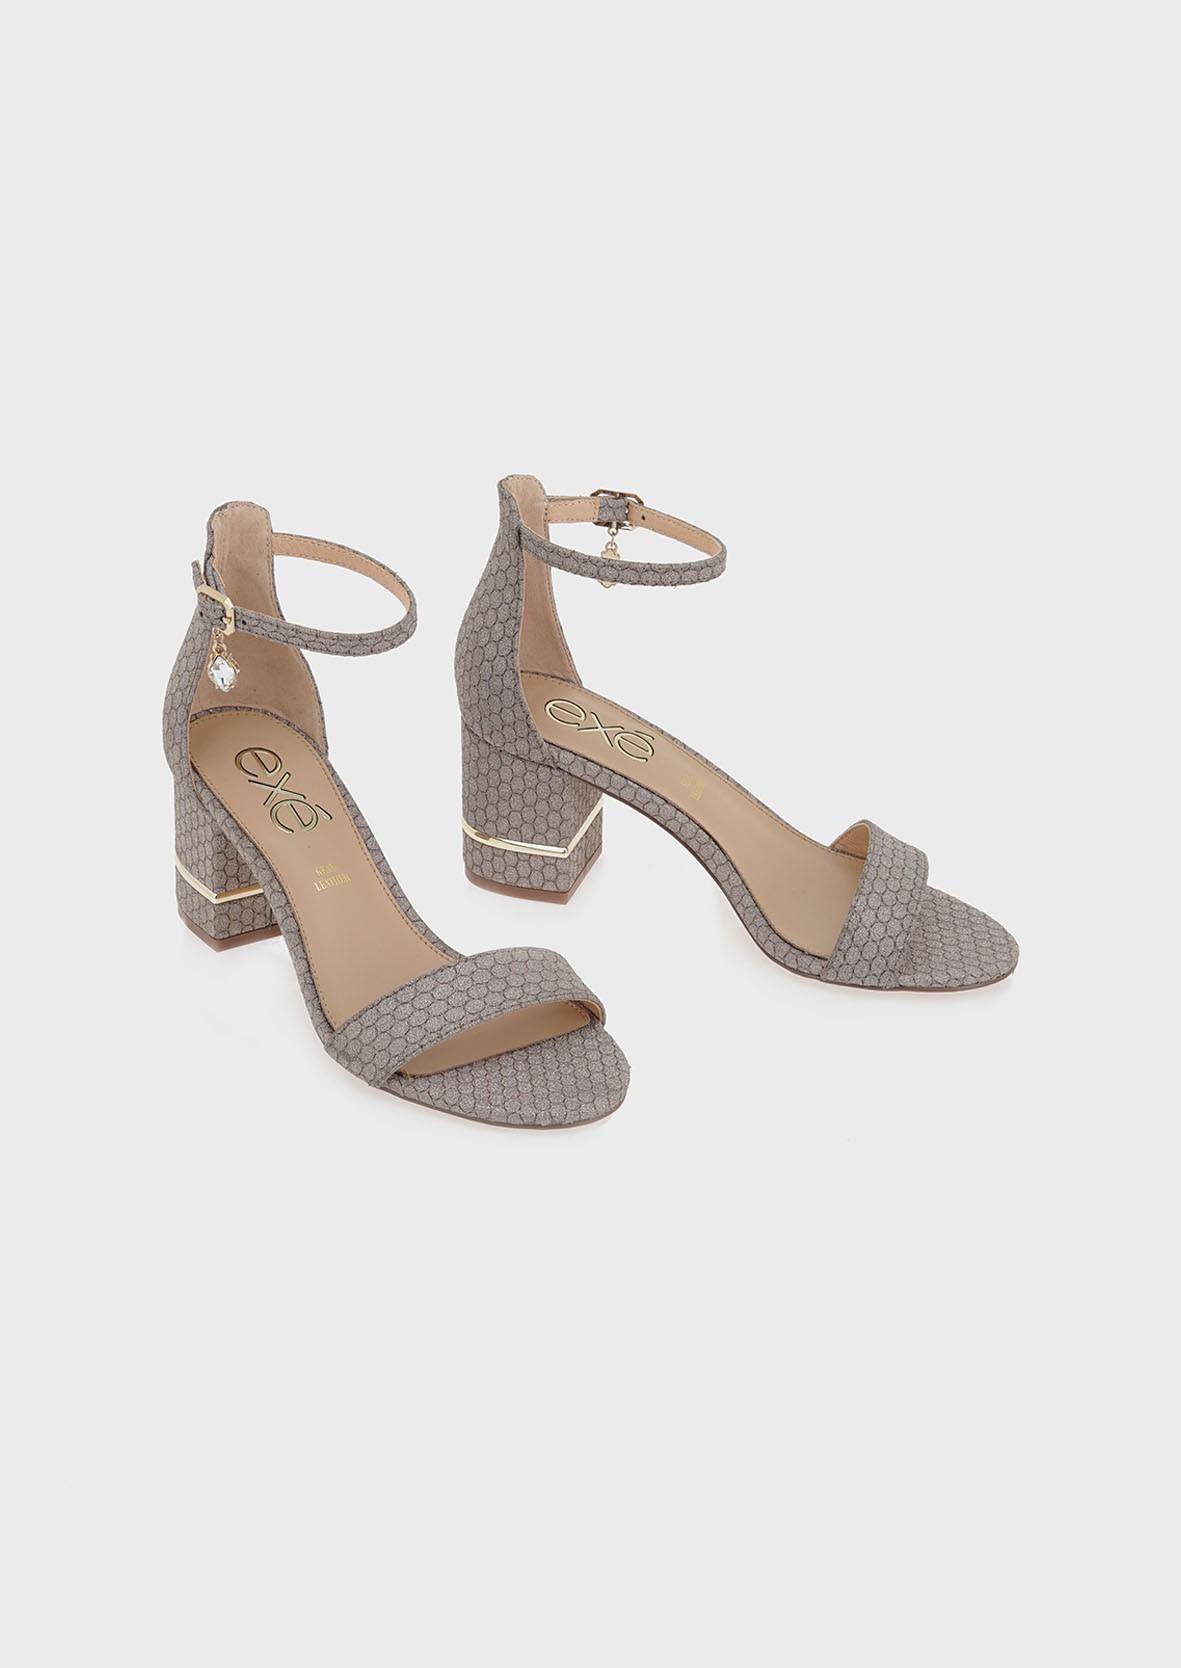 EXE Shoes Πέδιλα Γυναικεία PENNY-299 Ατσαλί Μπρονζέ Glitter M4700299403P